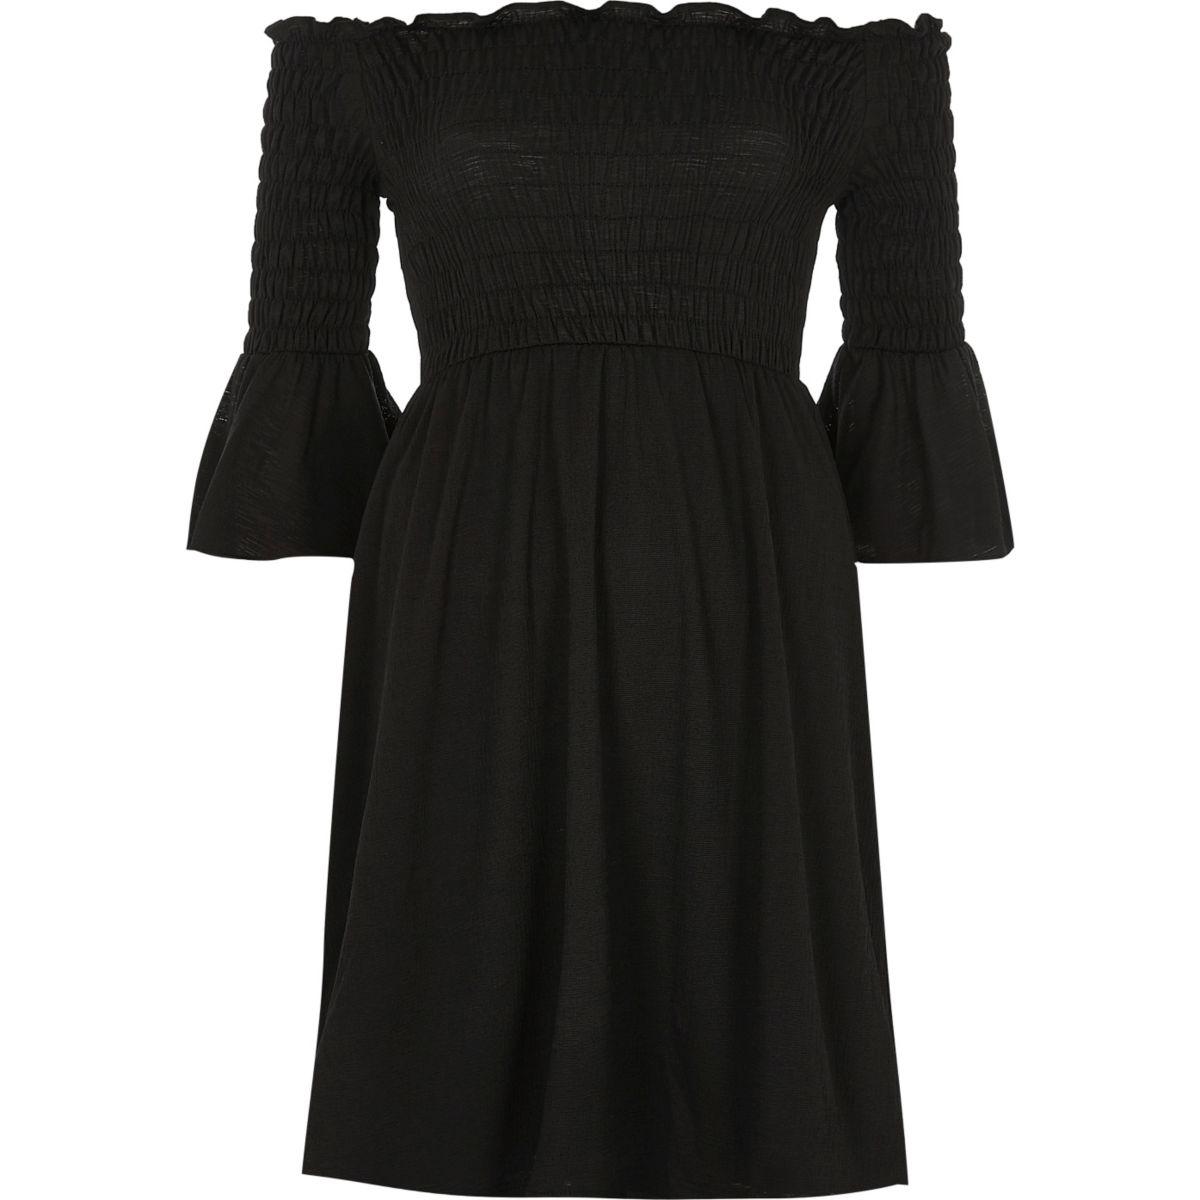 Black ruched flute sleeve bardot dress